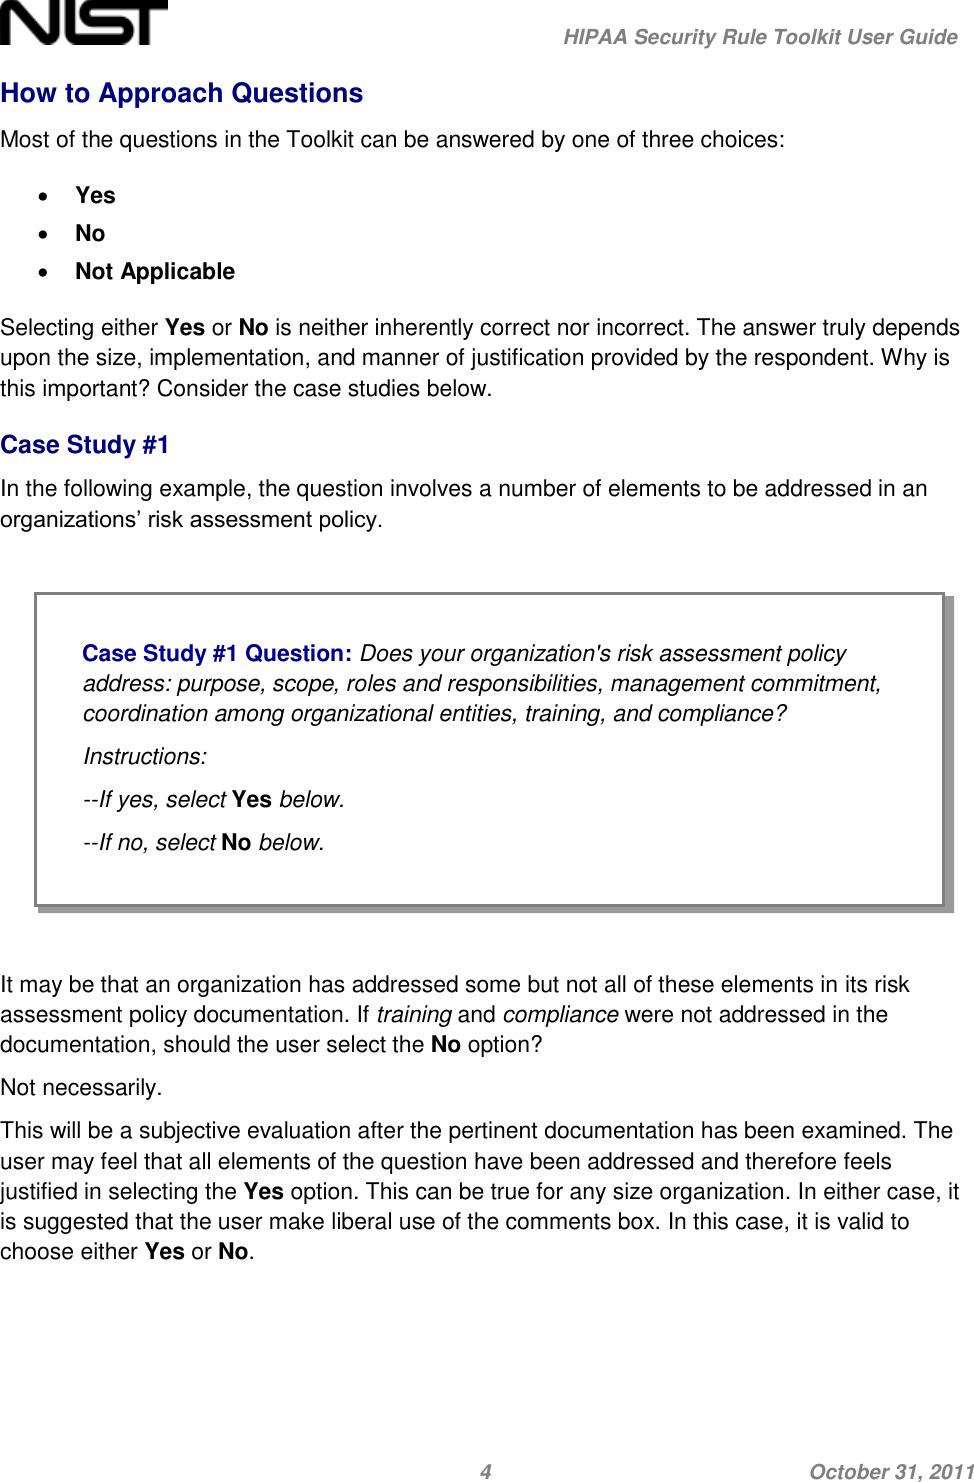 NIST HSR Toolkit User Guide